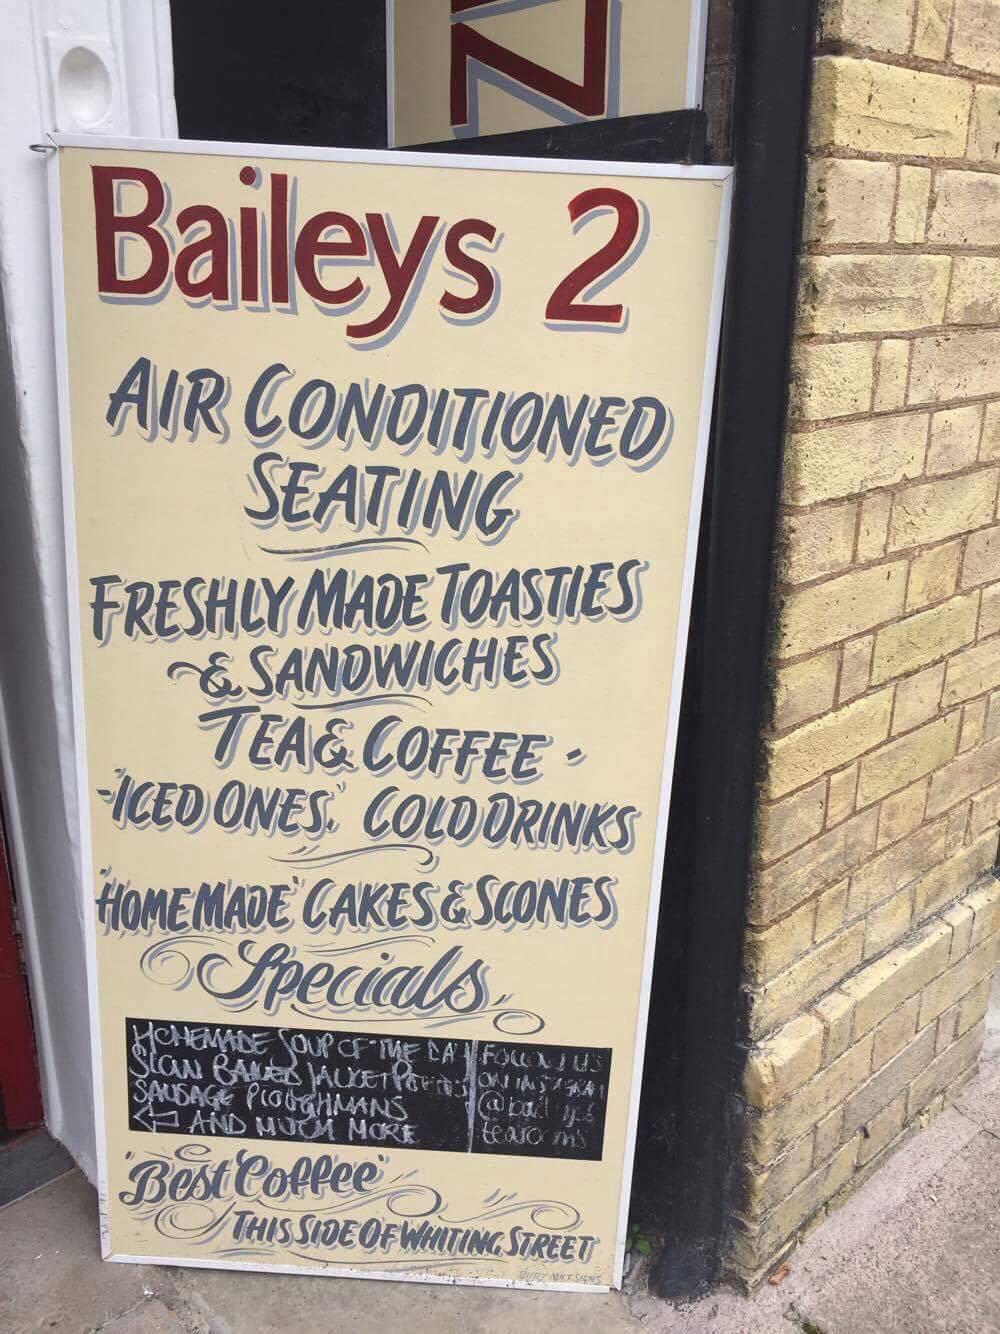 Lunch in Baileys 2